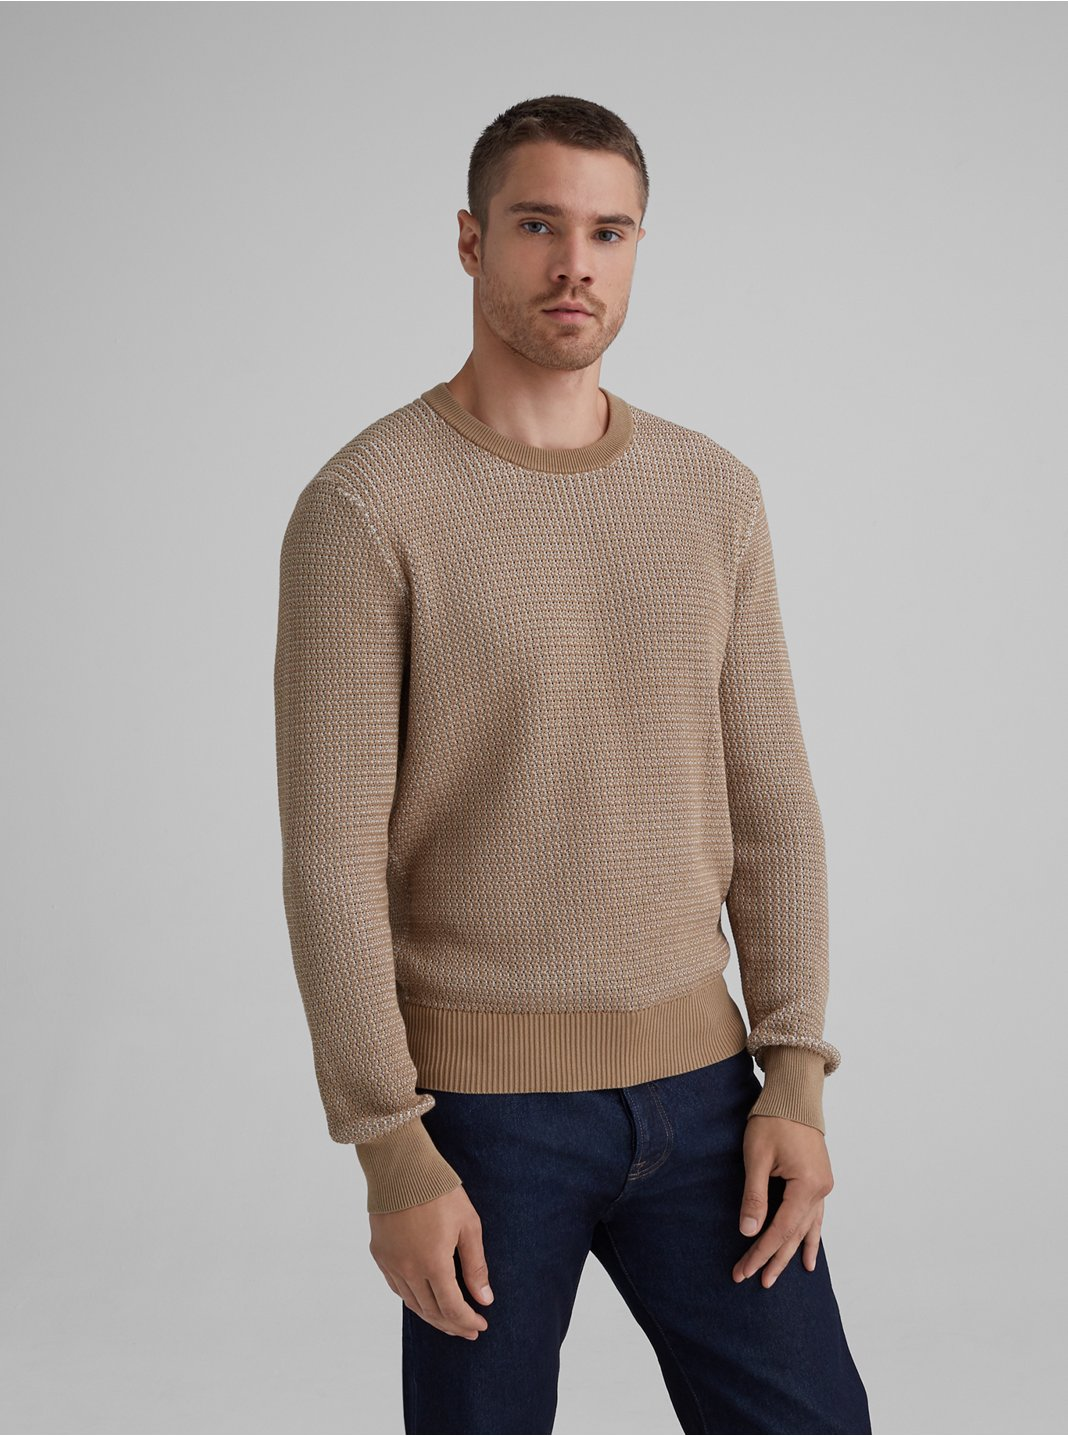 Sunset Crewneck Sweater